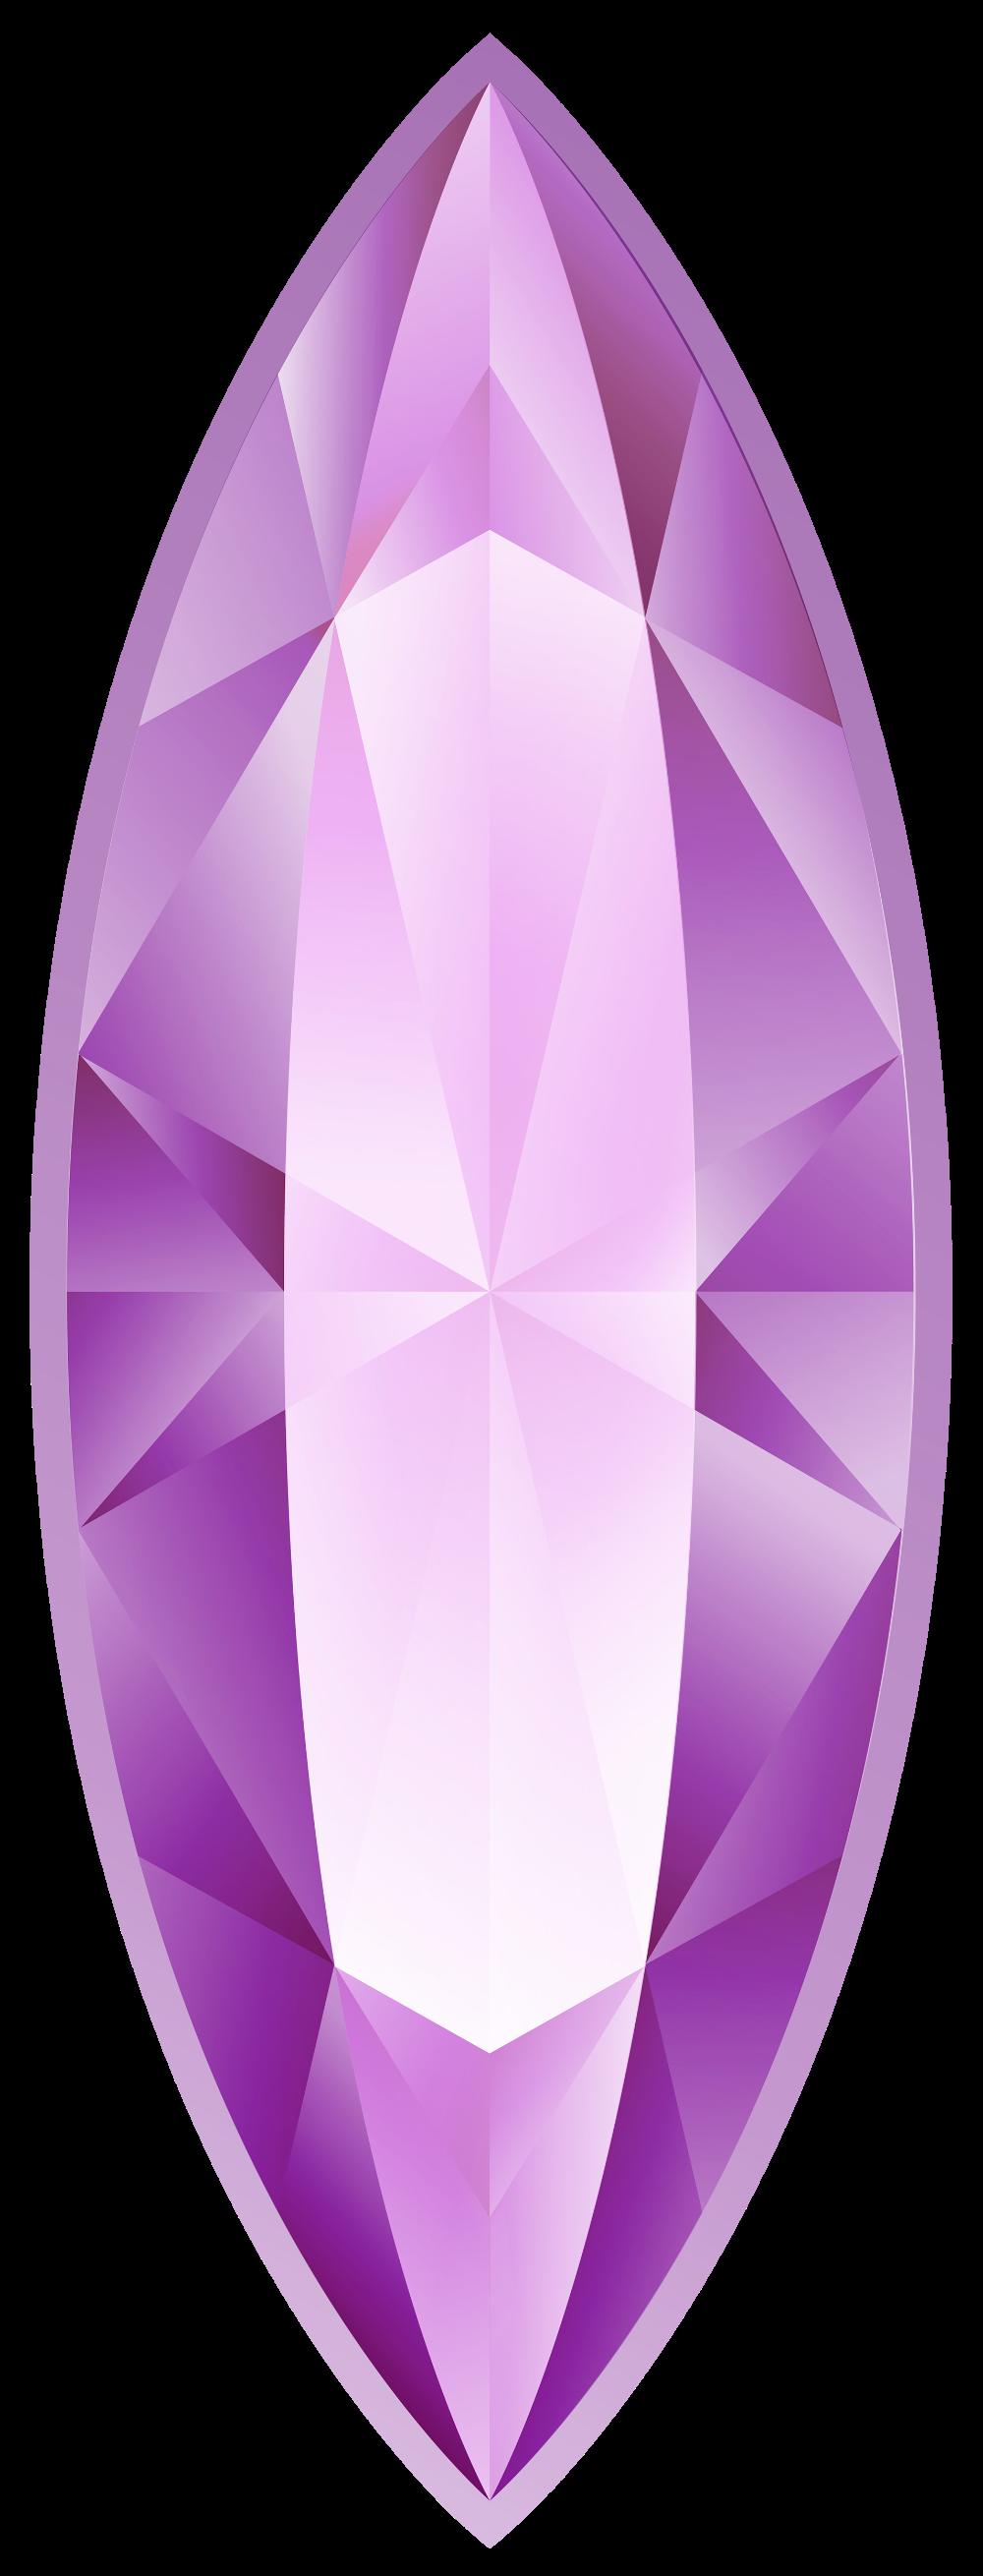 Purple Diamond Png Clip Art Image Gallery Yopriceville High Diamond Image Purple Diamond Clip Art